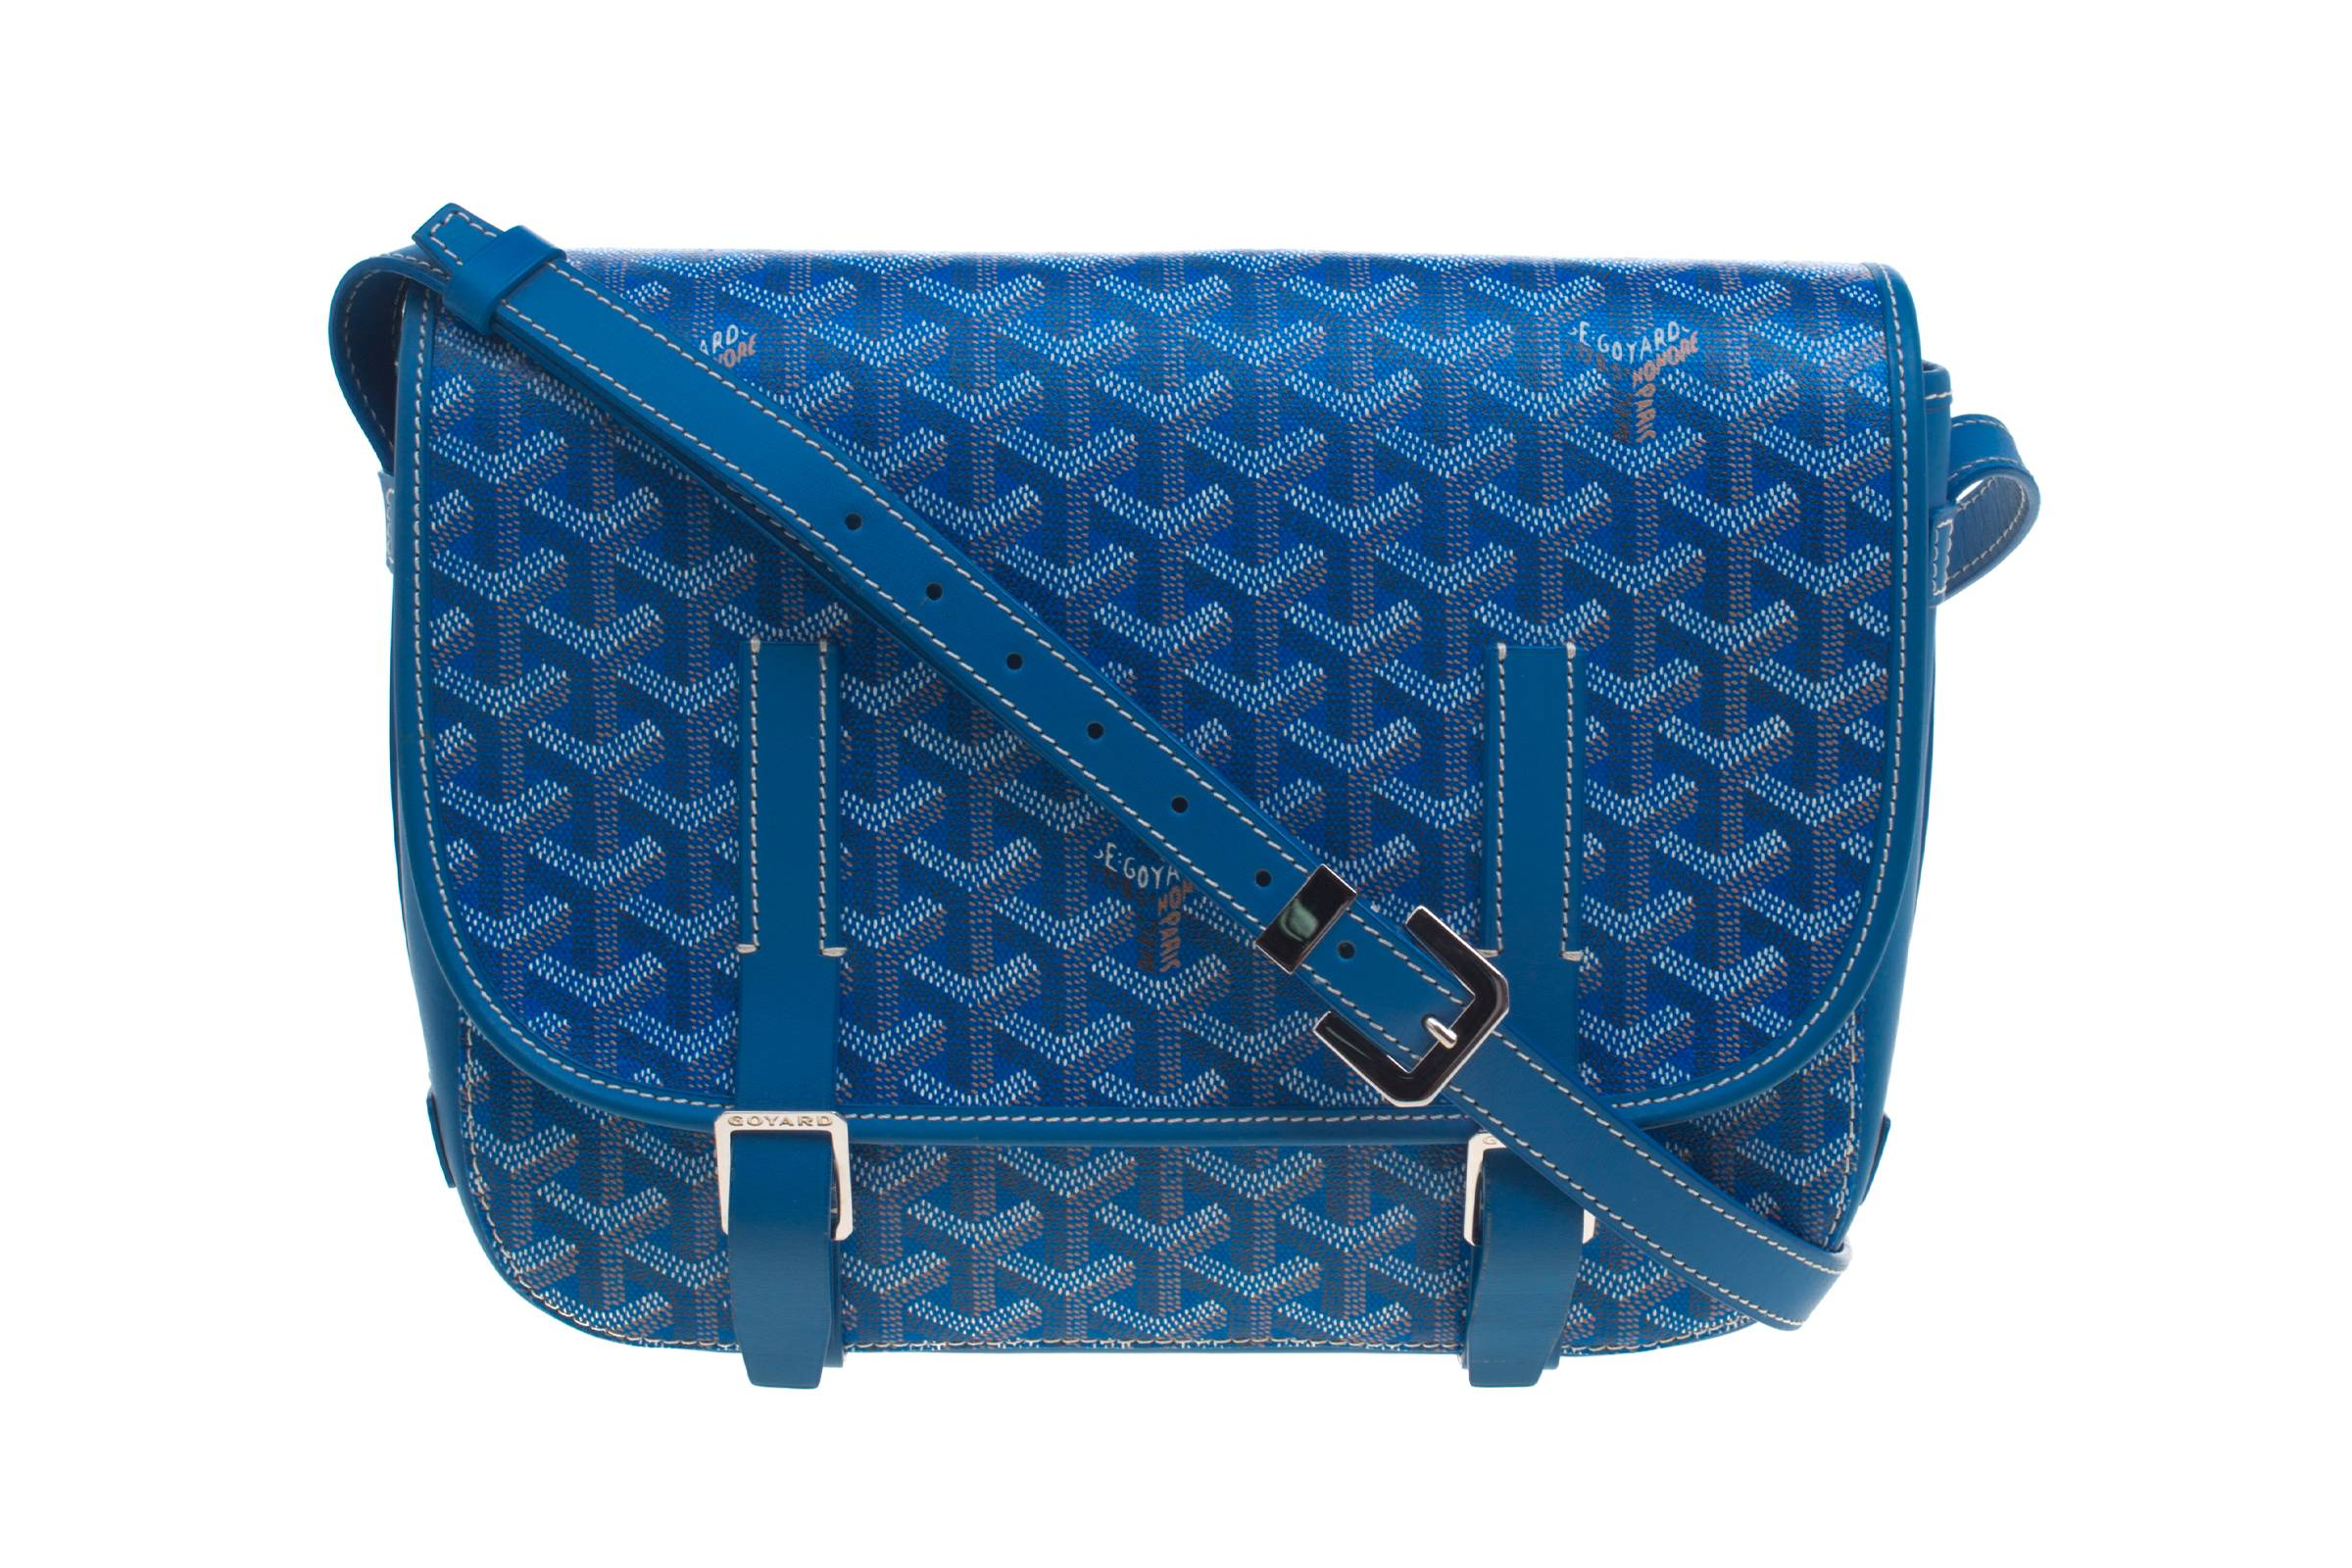 Goyard Blue Chevron Print Coated Canvas Belvedere MM Saddle Bag